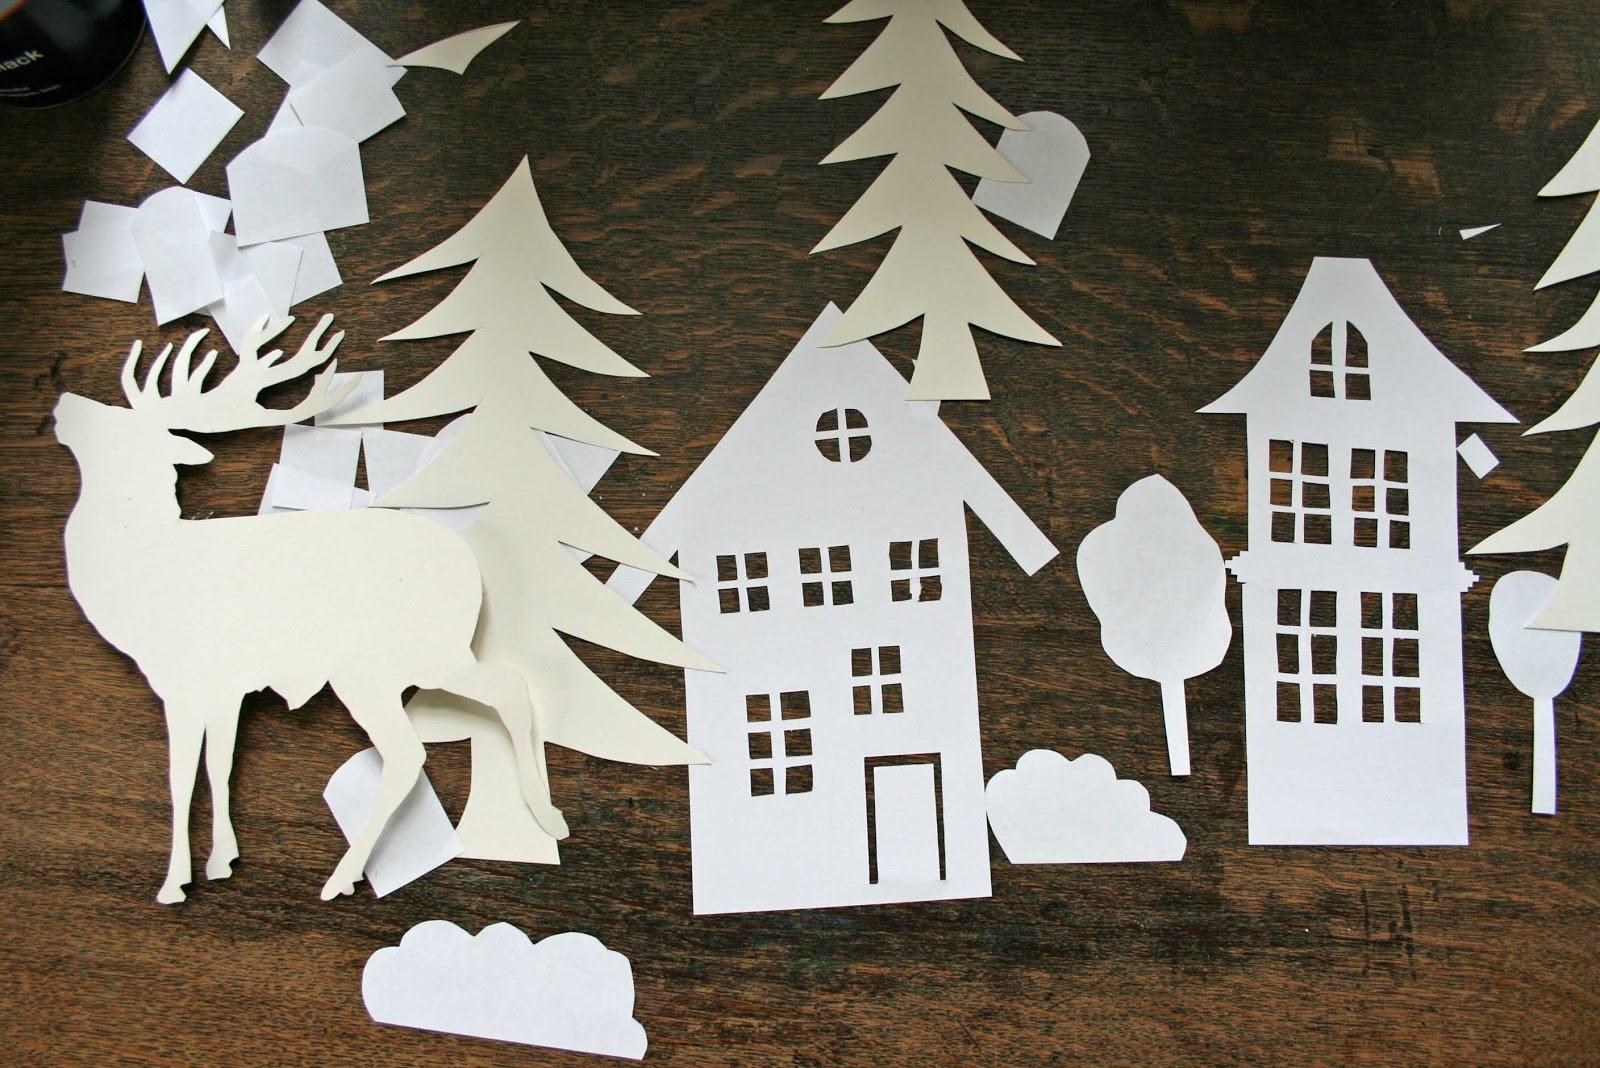 haseundflo diy weihnachtsstadt. Black Bedroom Furniture Sets. Home Design Ideas